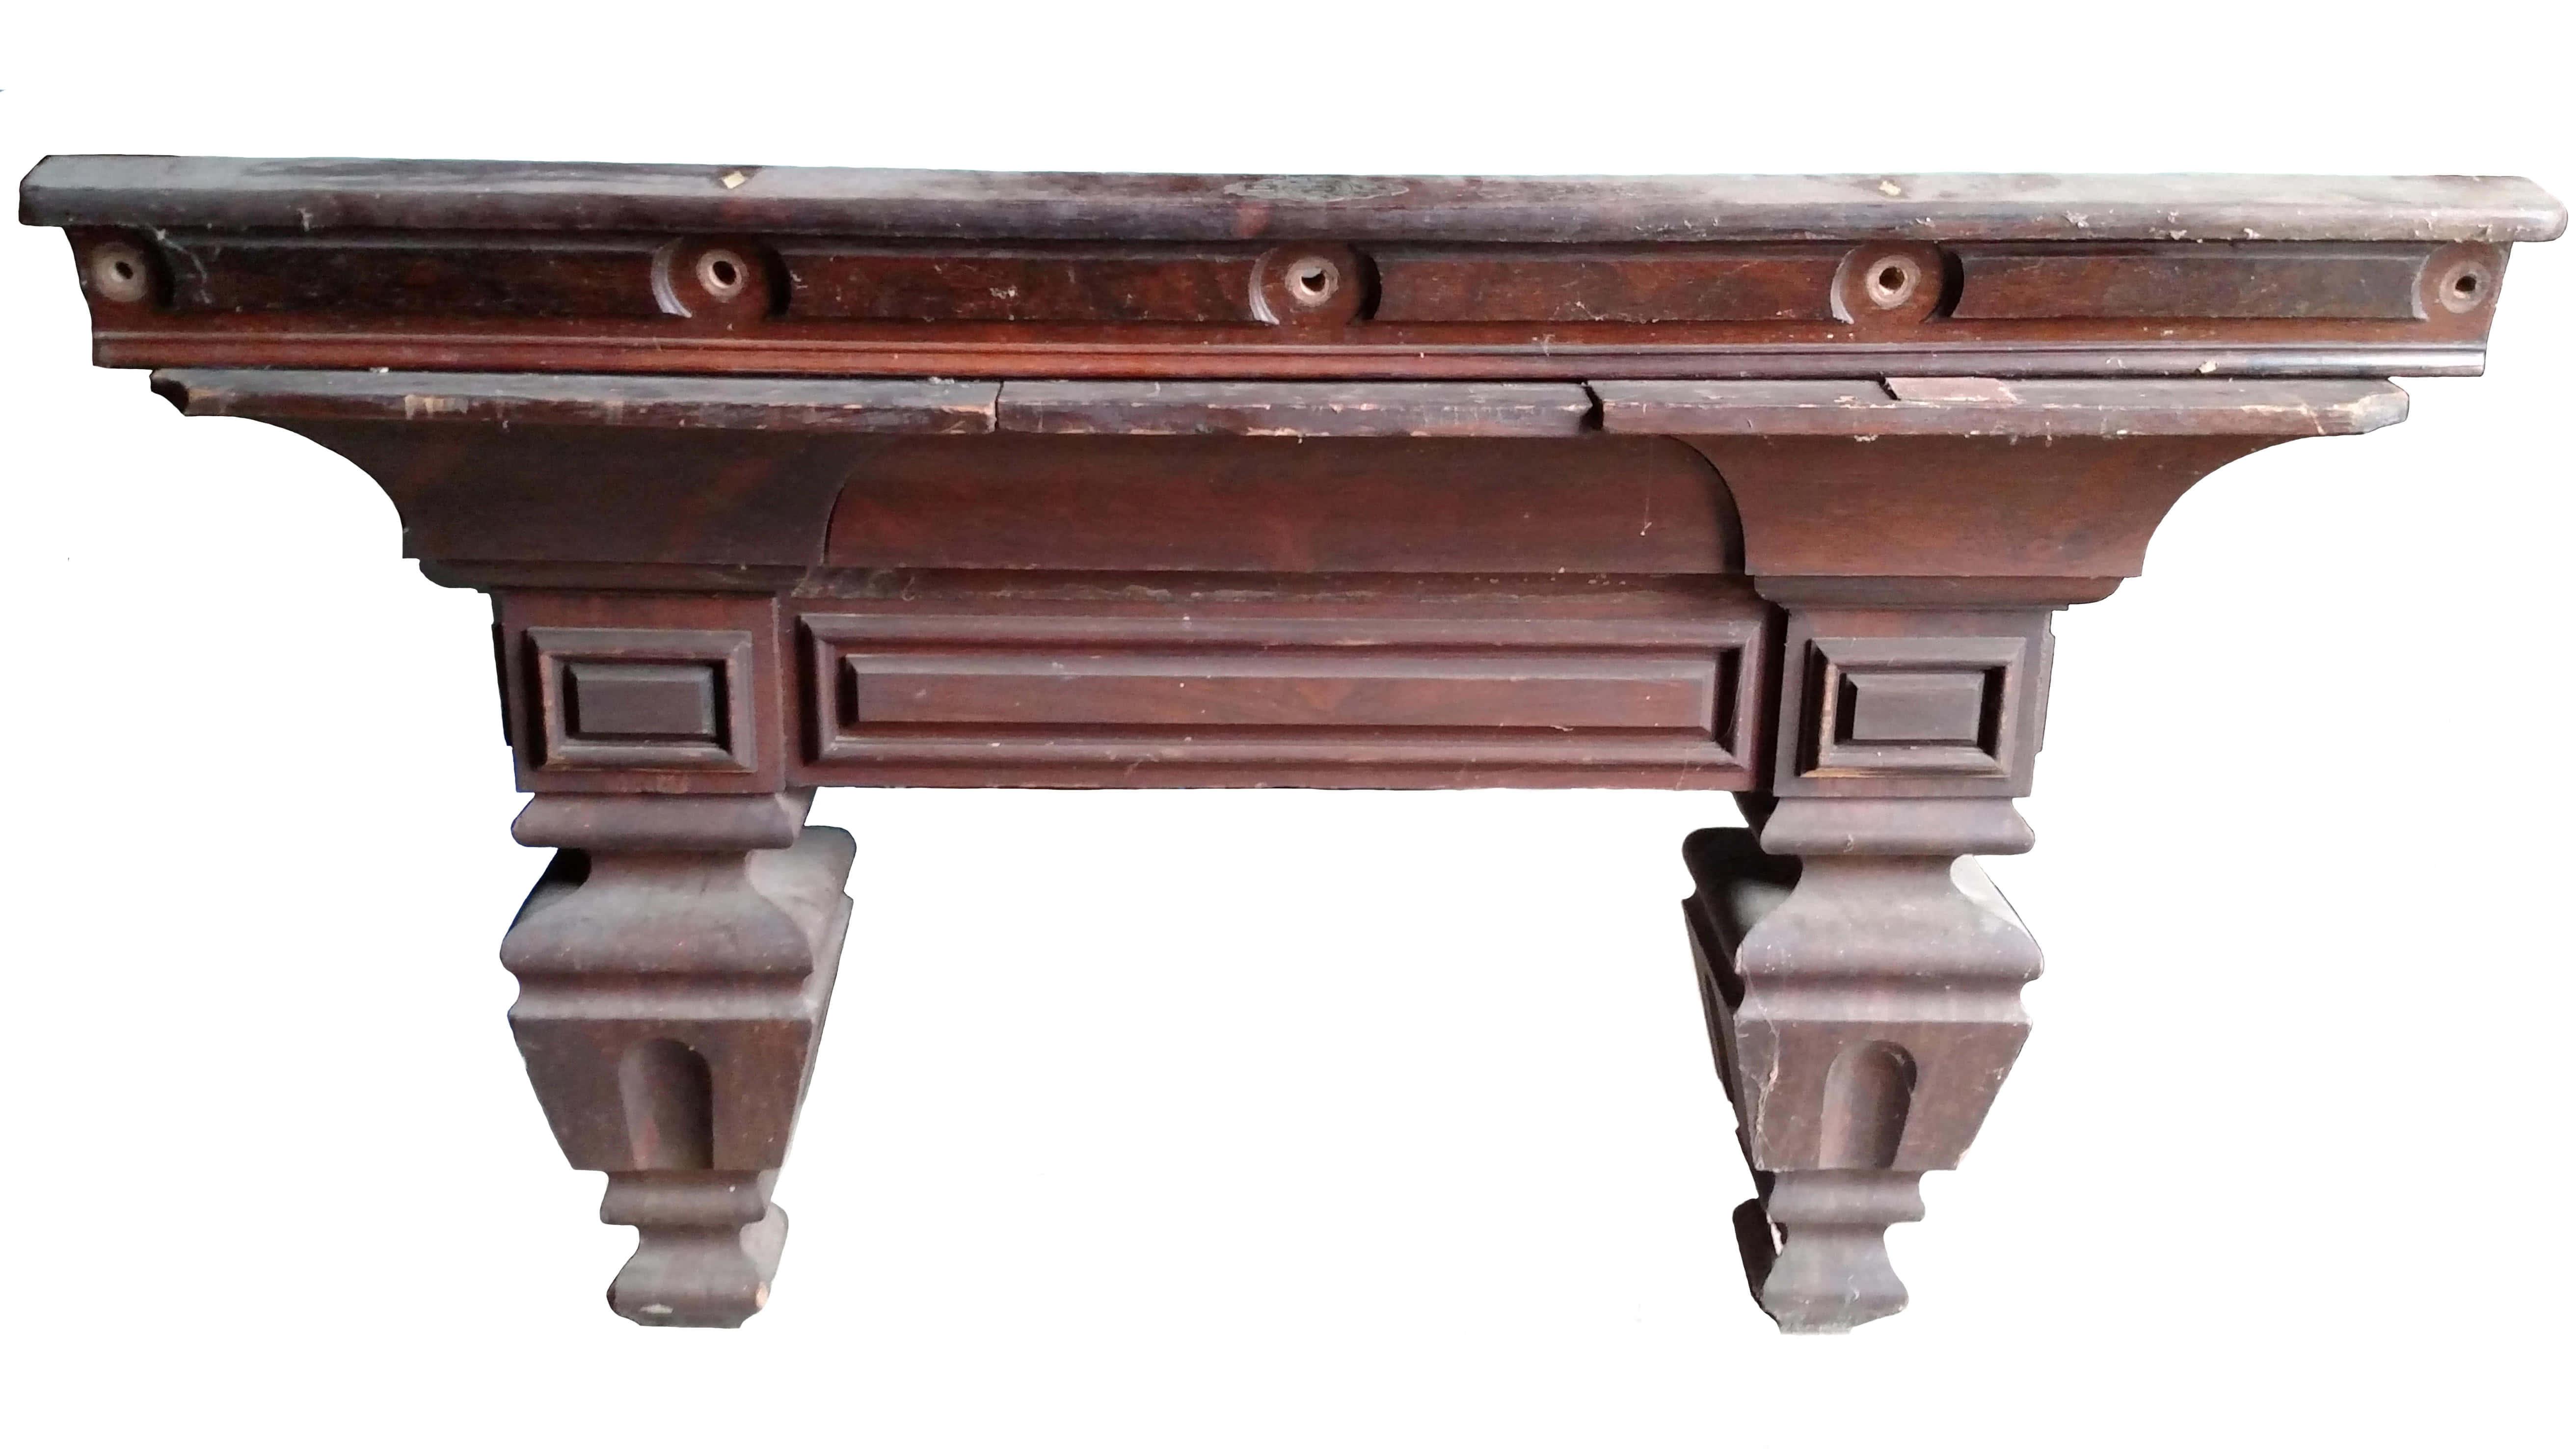 Antique J.E. McIntosh Billiard Company New York Walnut Pool Table